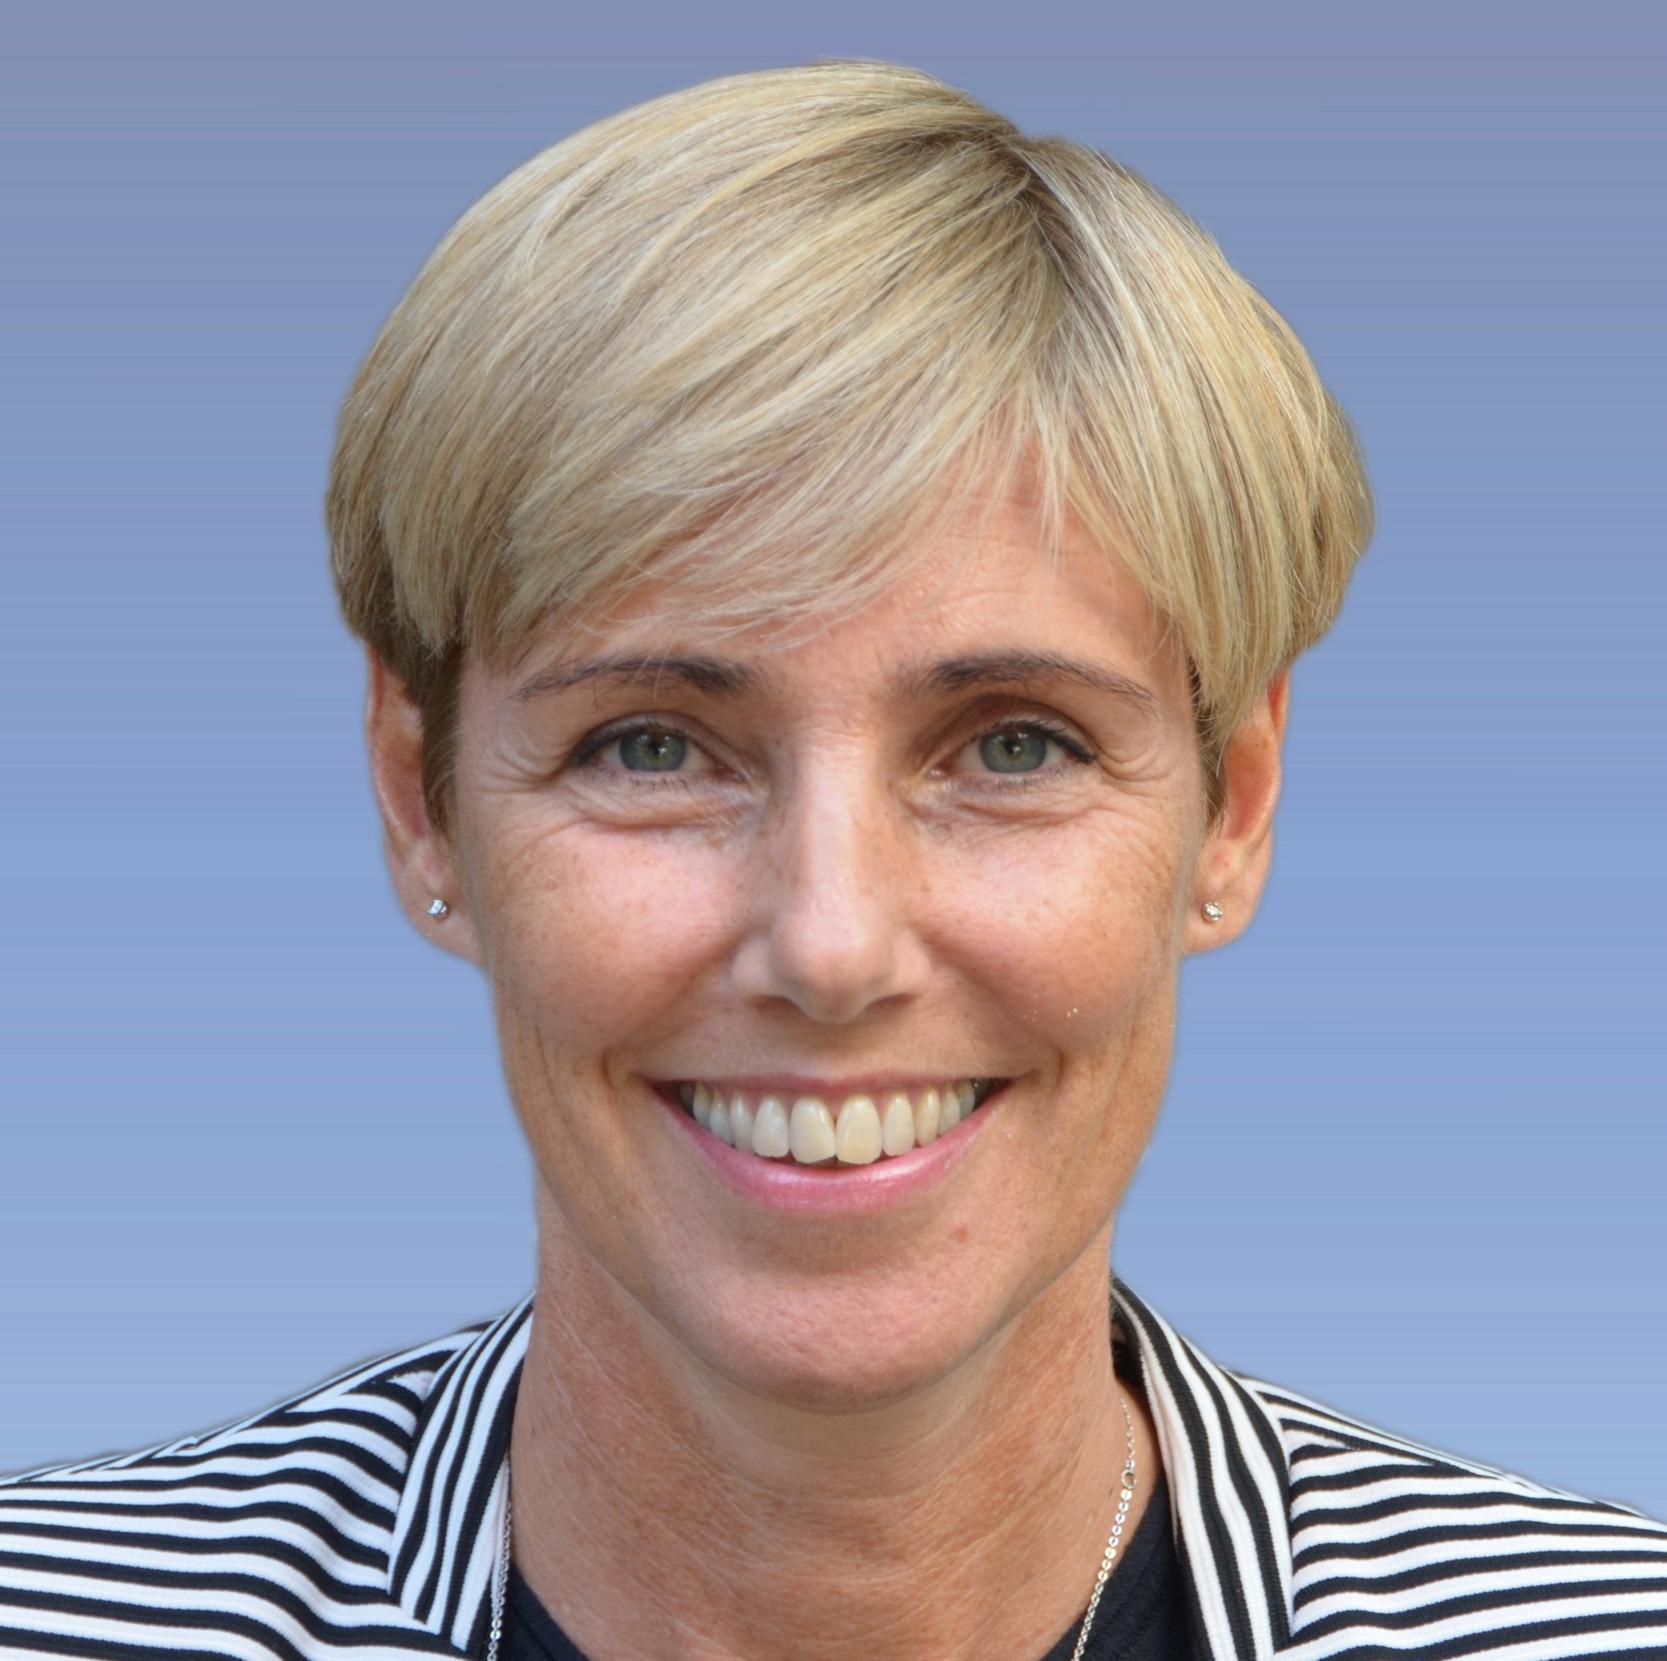 Alessandra Luksch, Direttore degli Osservatori Digital Trasformation Academy e Startup Intelligence